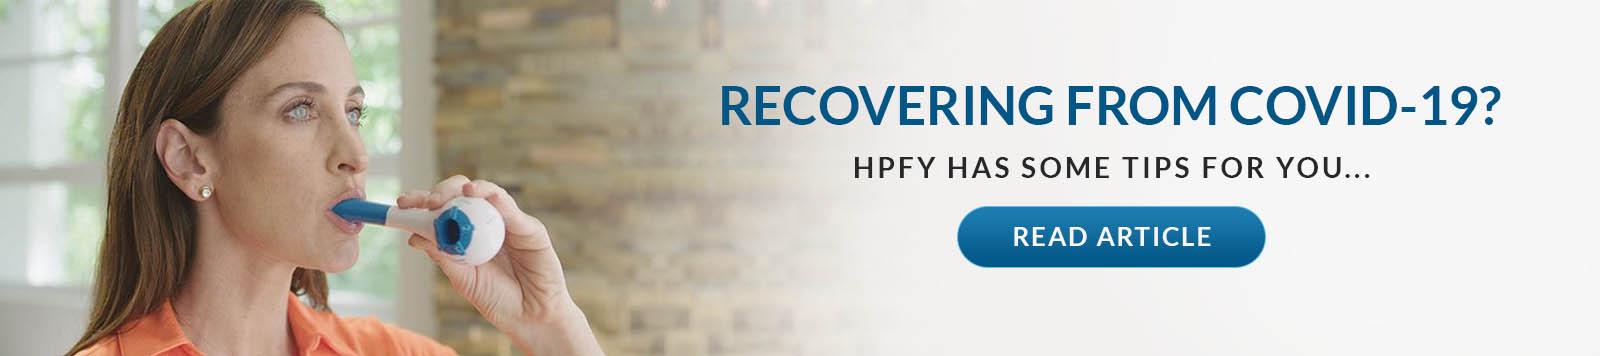 HPFY Health And Wellness